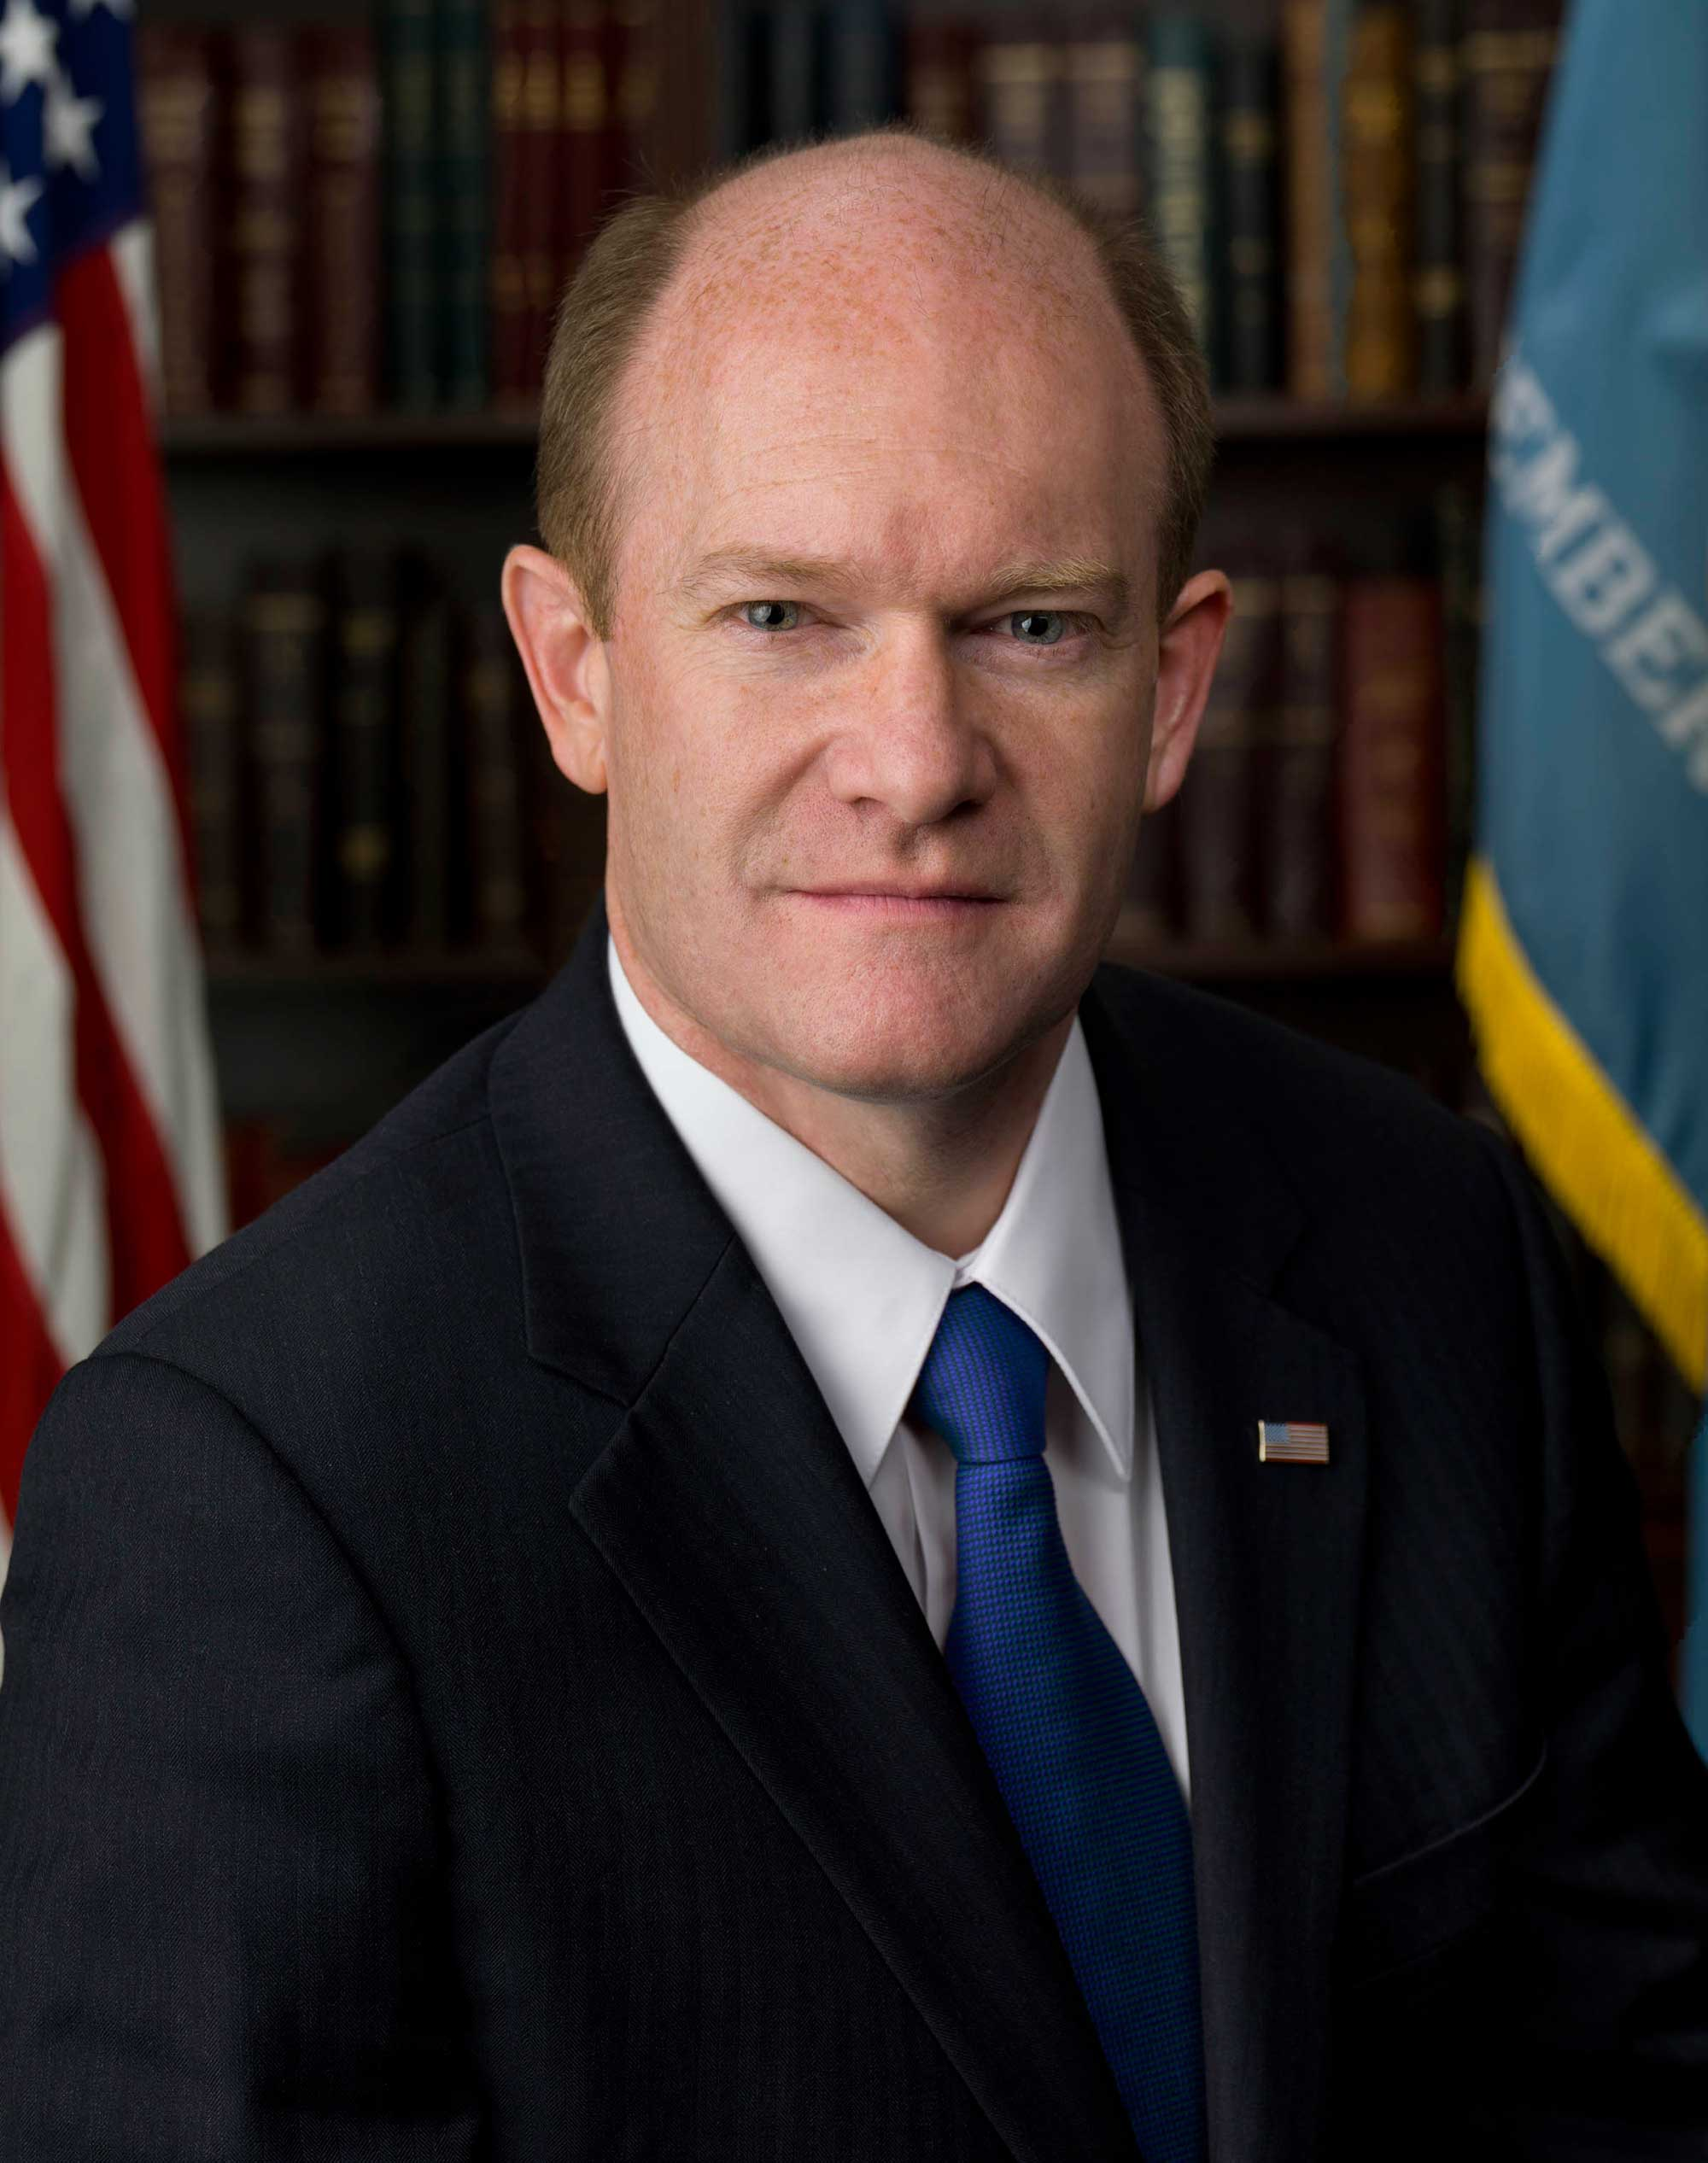 Image of Delaware's U.S. Senator Chris Coons